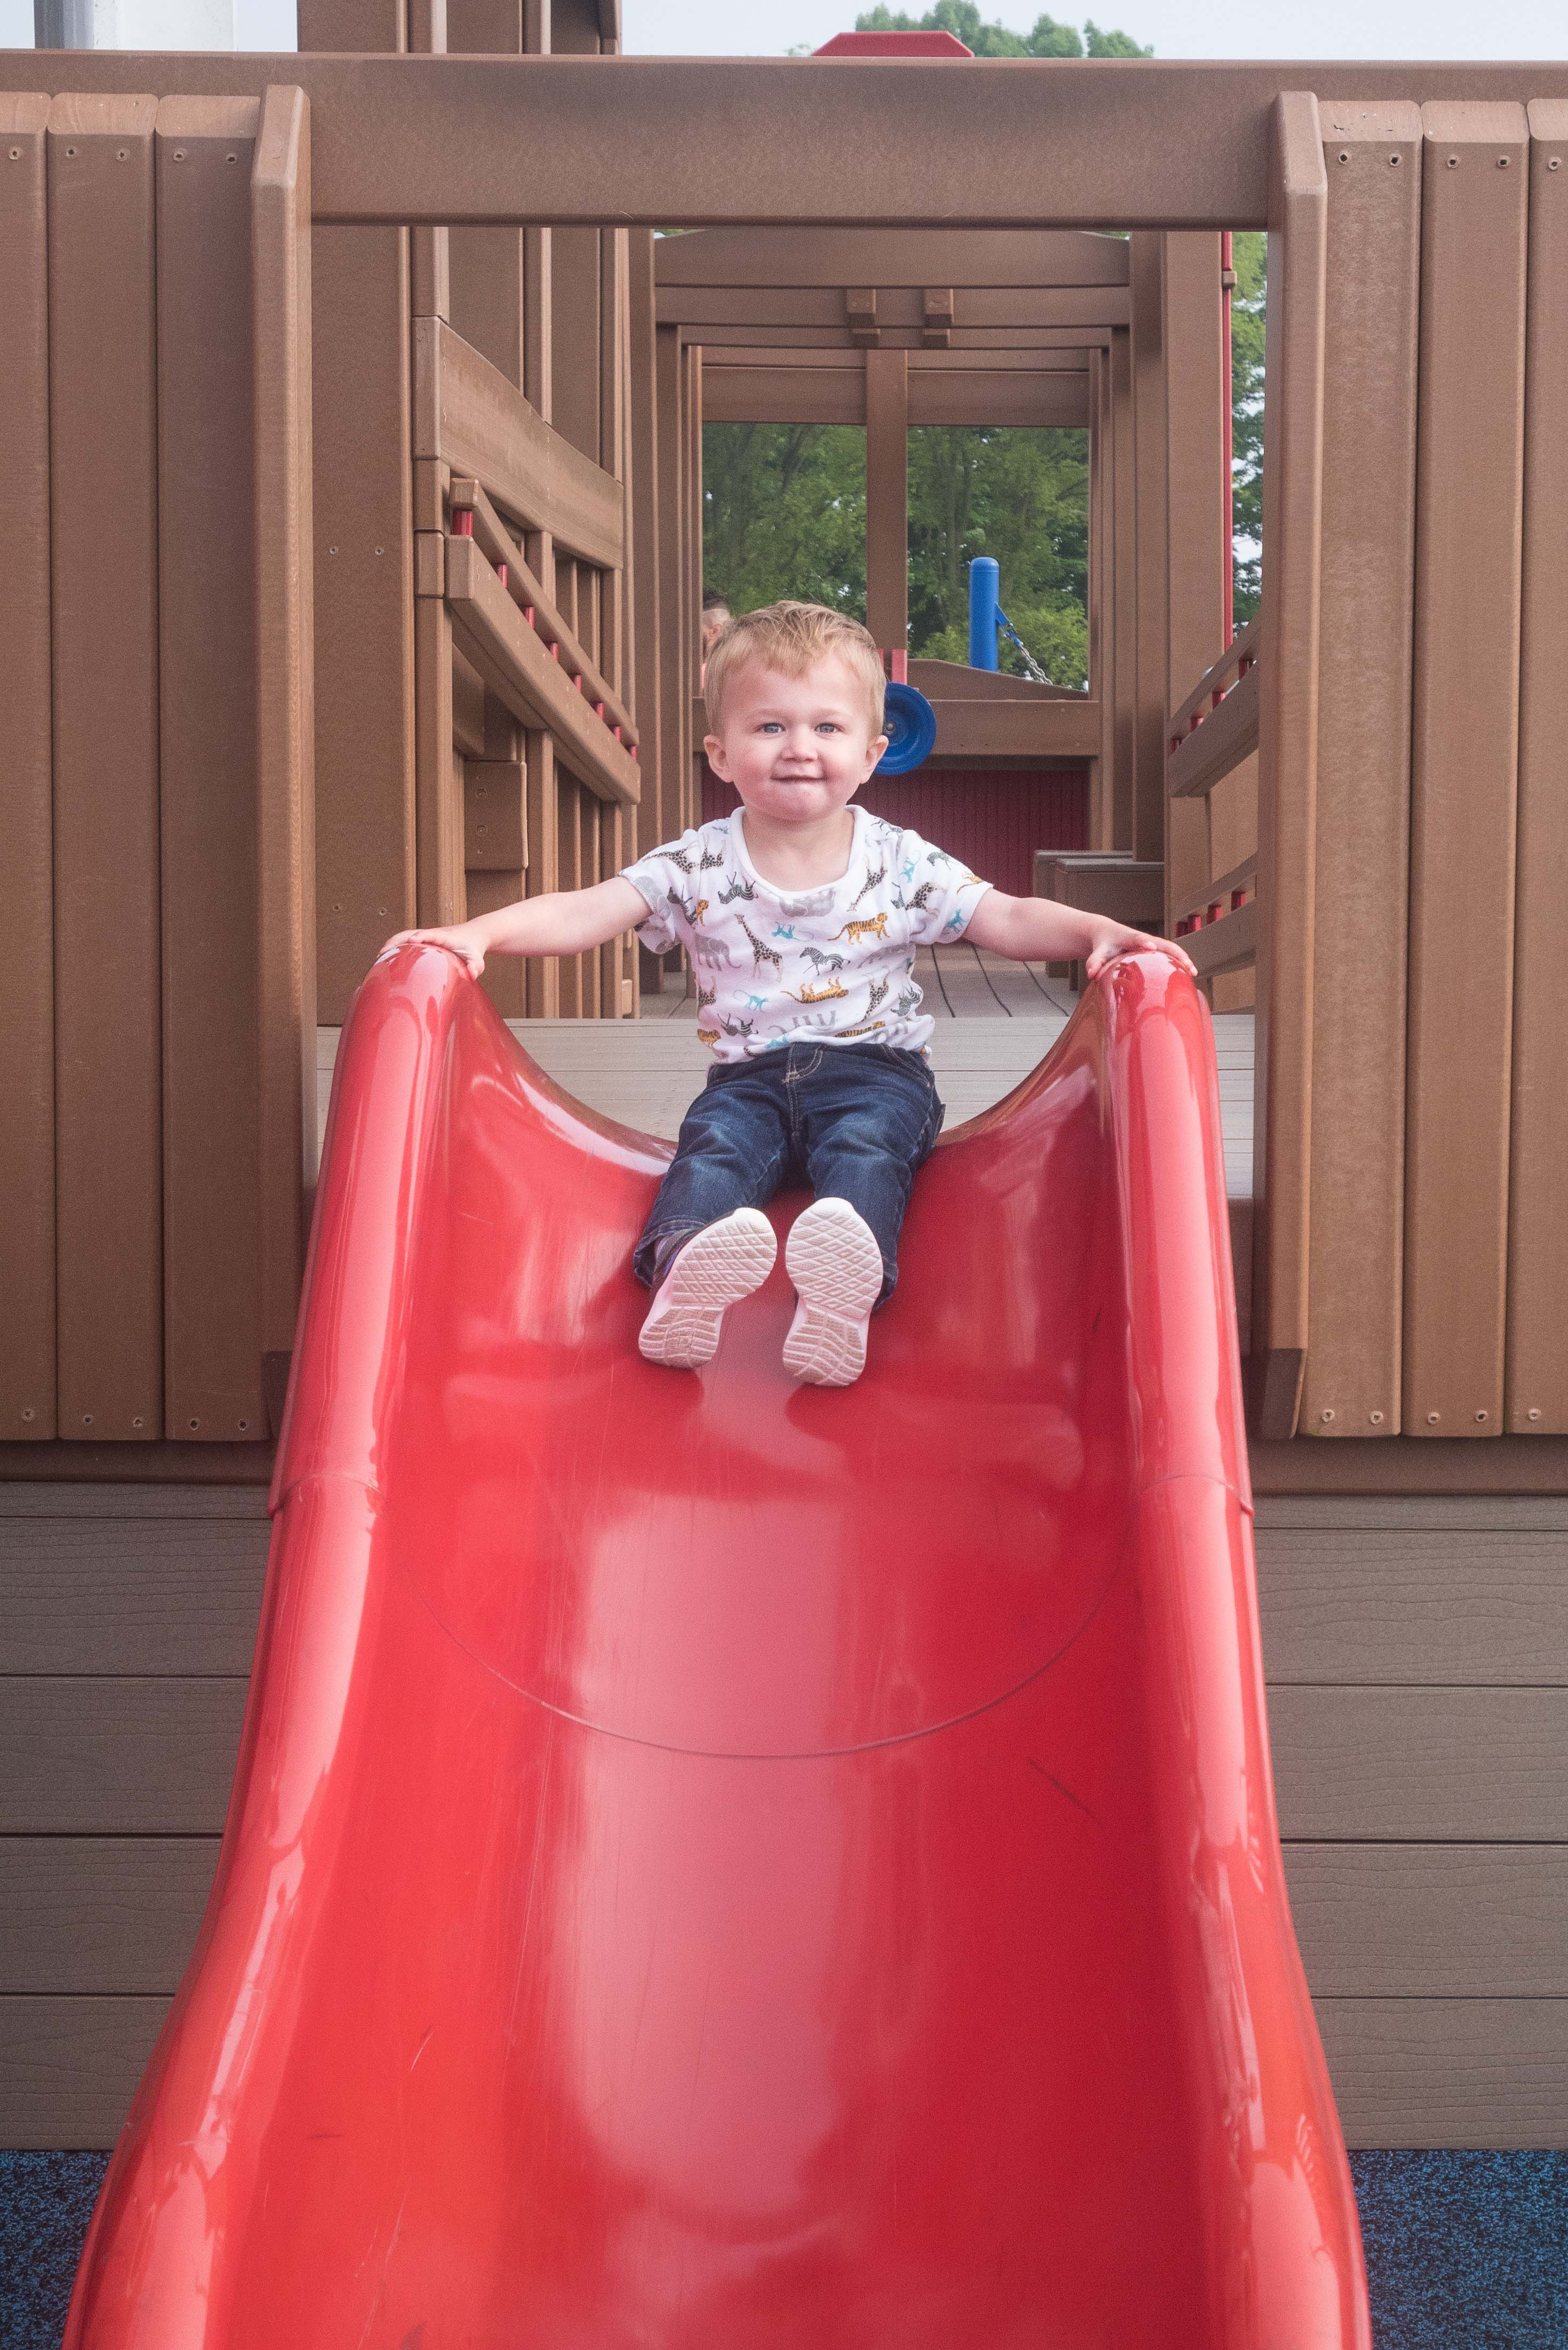 Tommy on the Slide June 2019 | https://www.roseclearfield.com